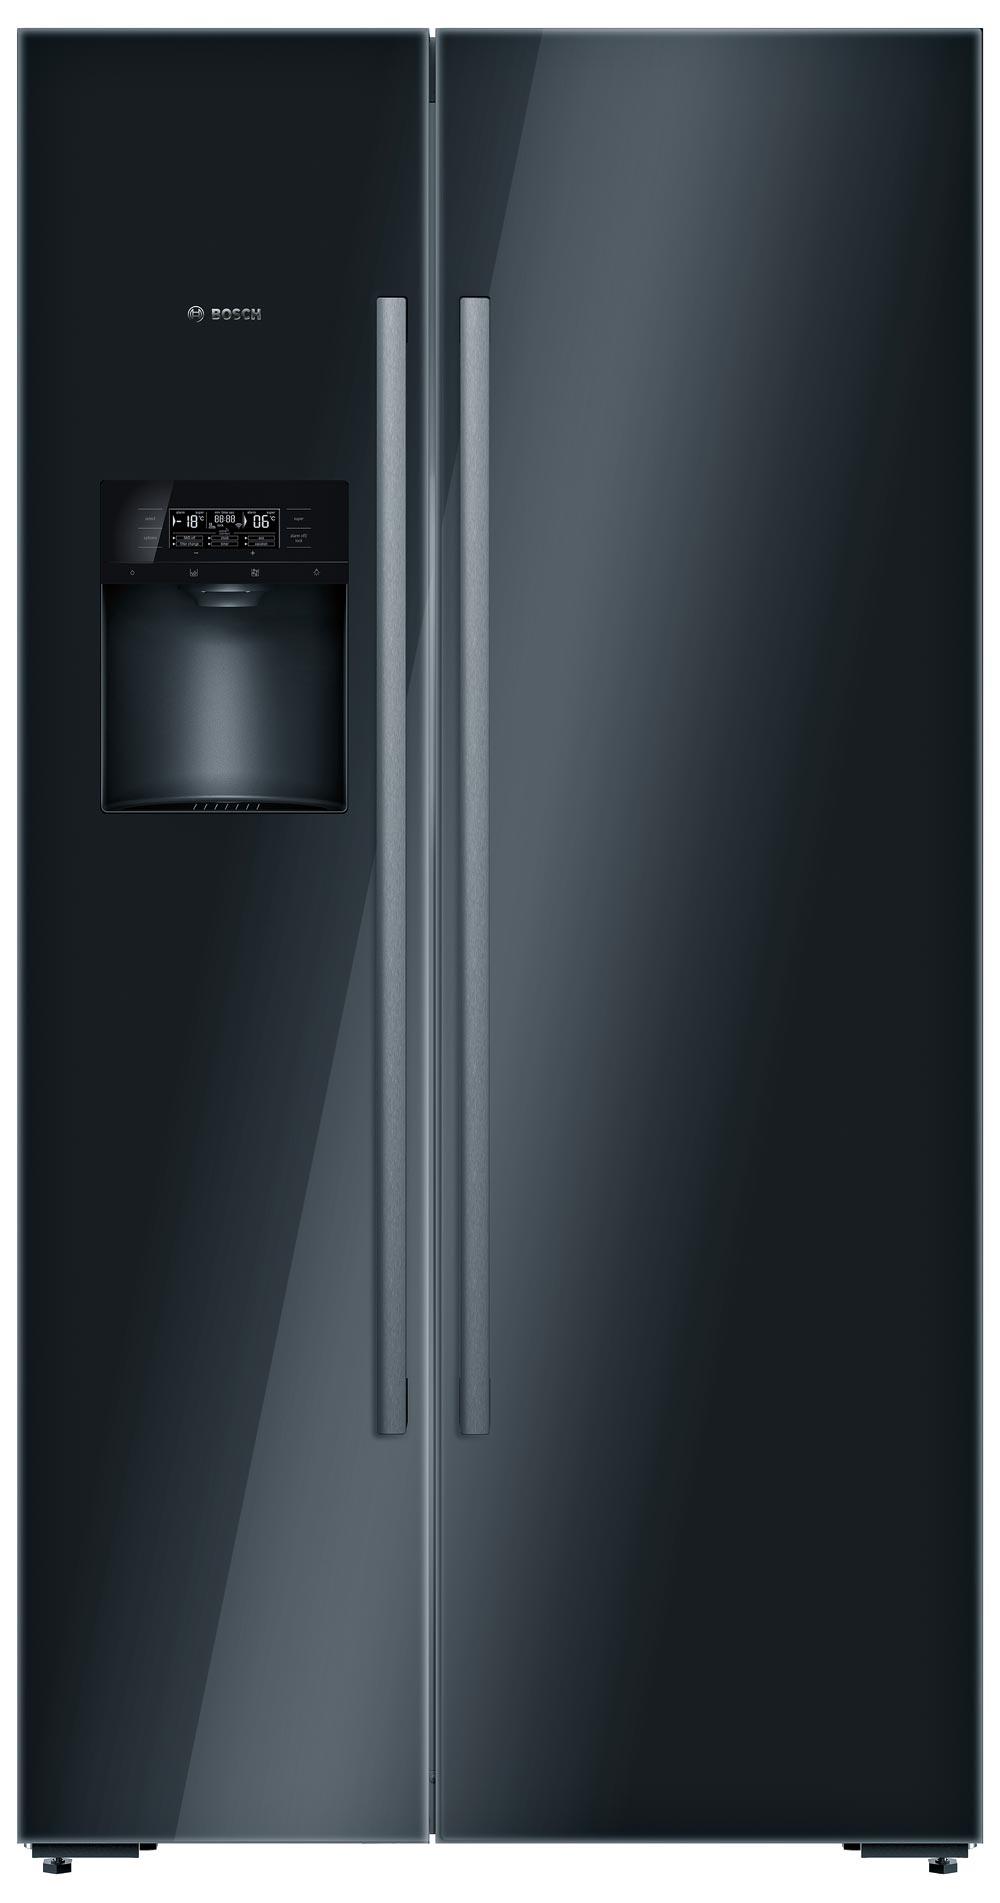 Bosch Amerikaanse Koelkast KAD92SB30   Ad Kokx Witgoed